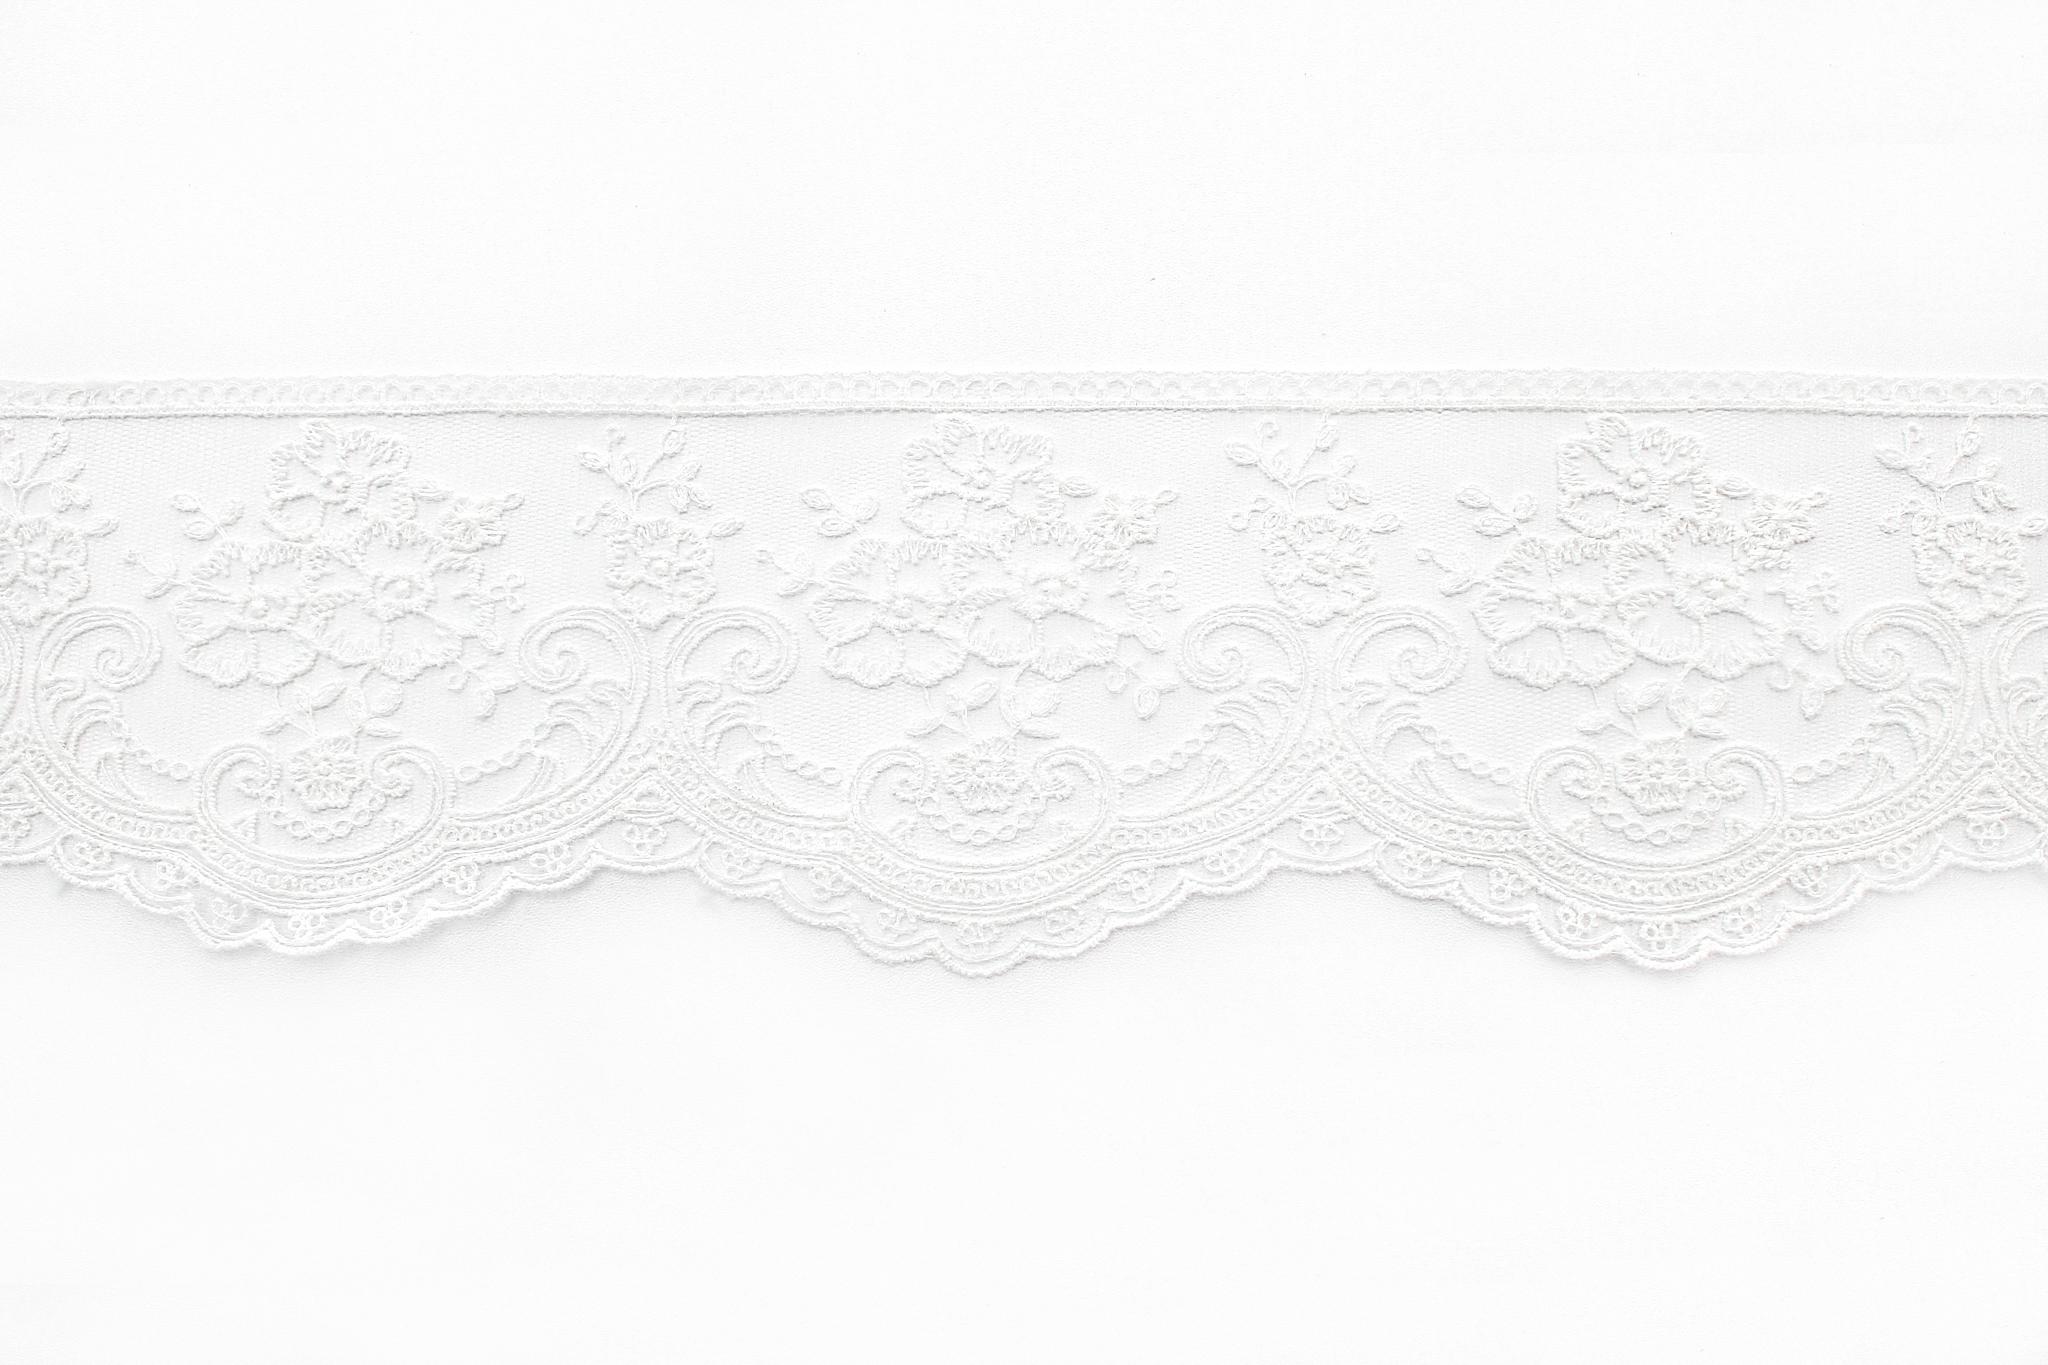 Кружево белое2, 9 см